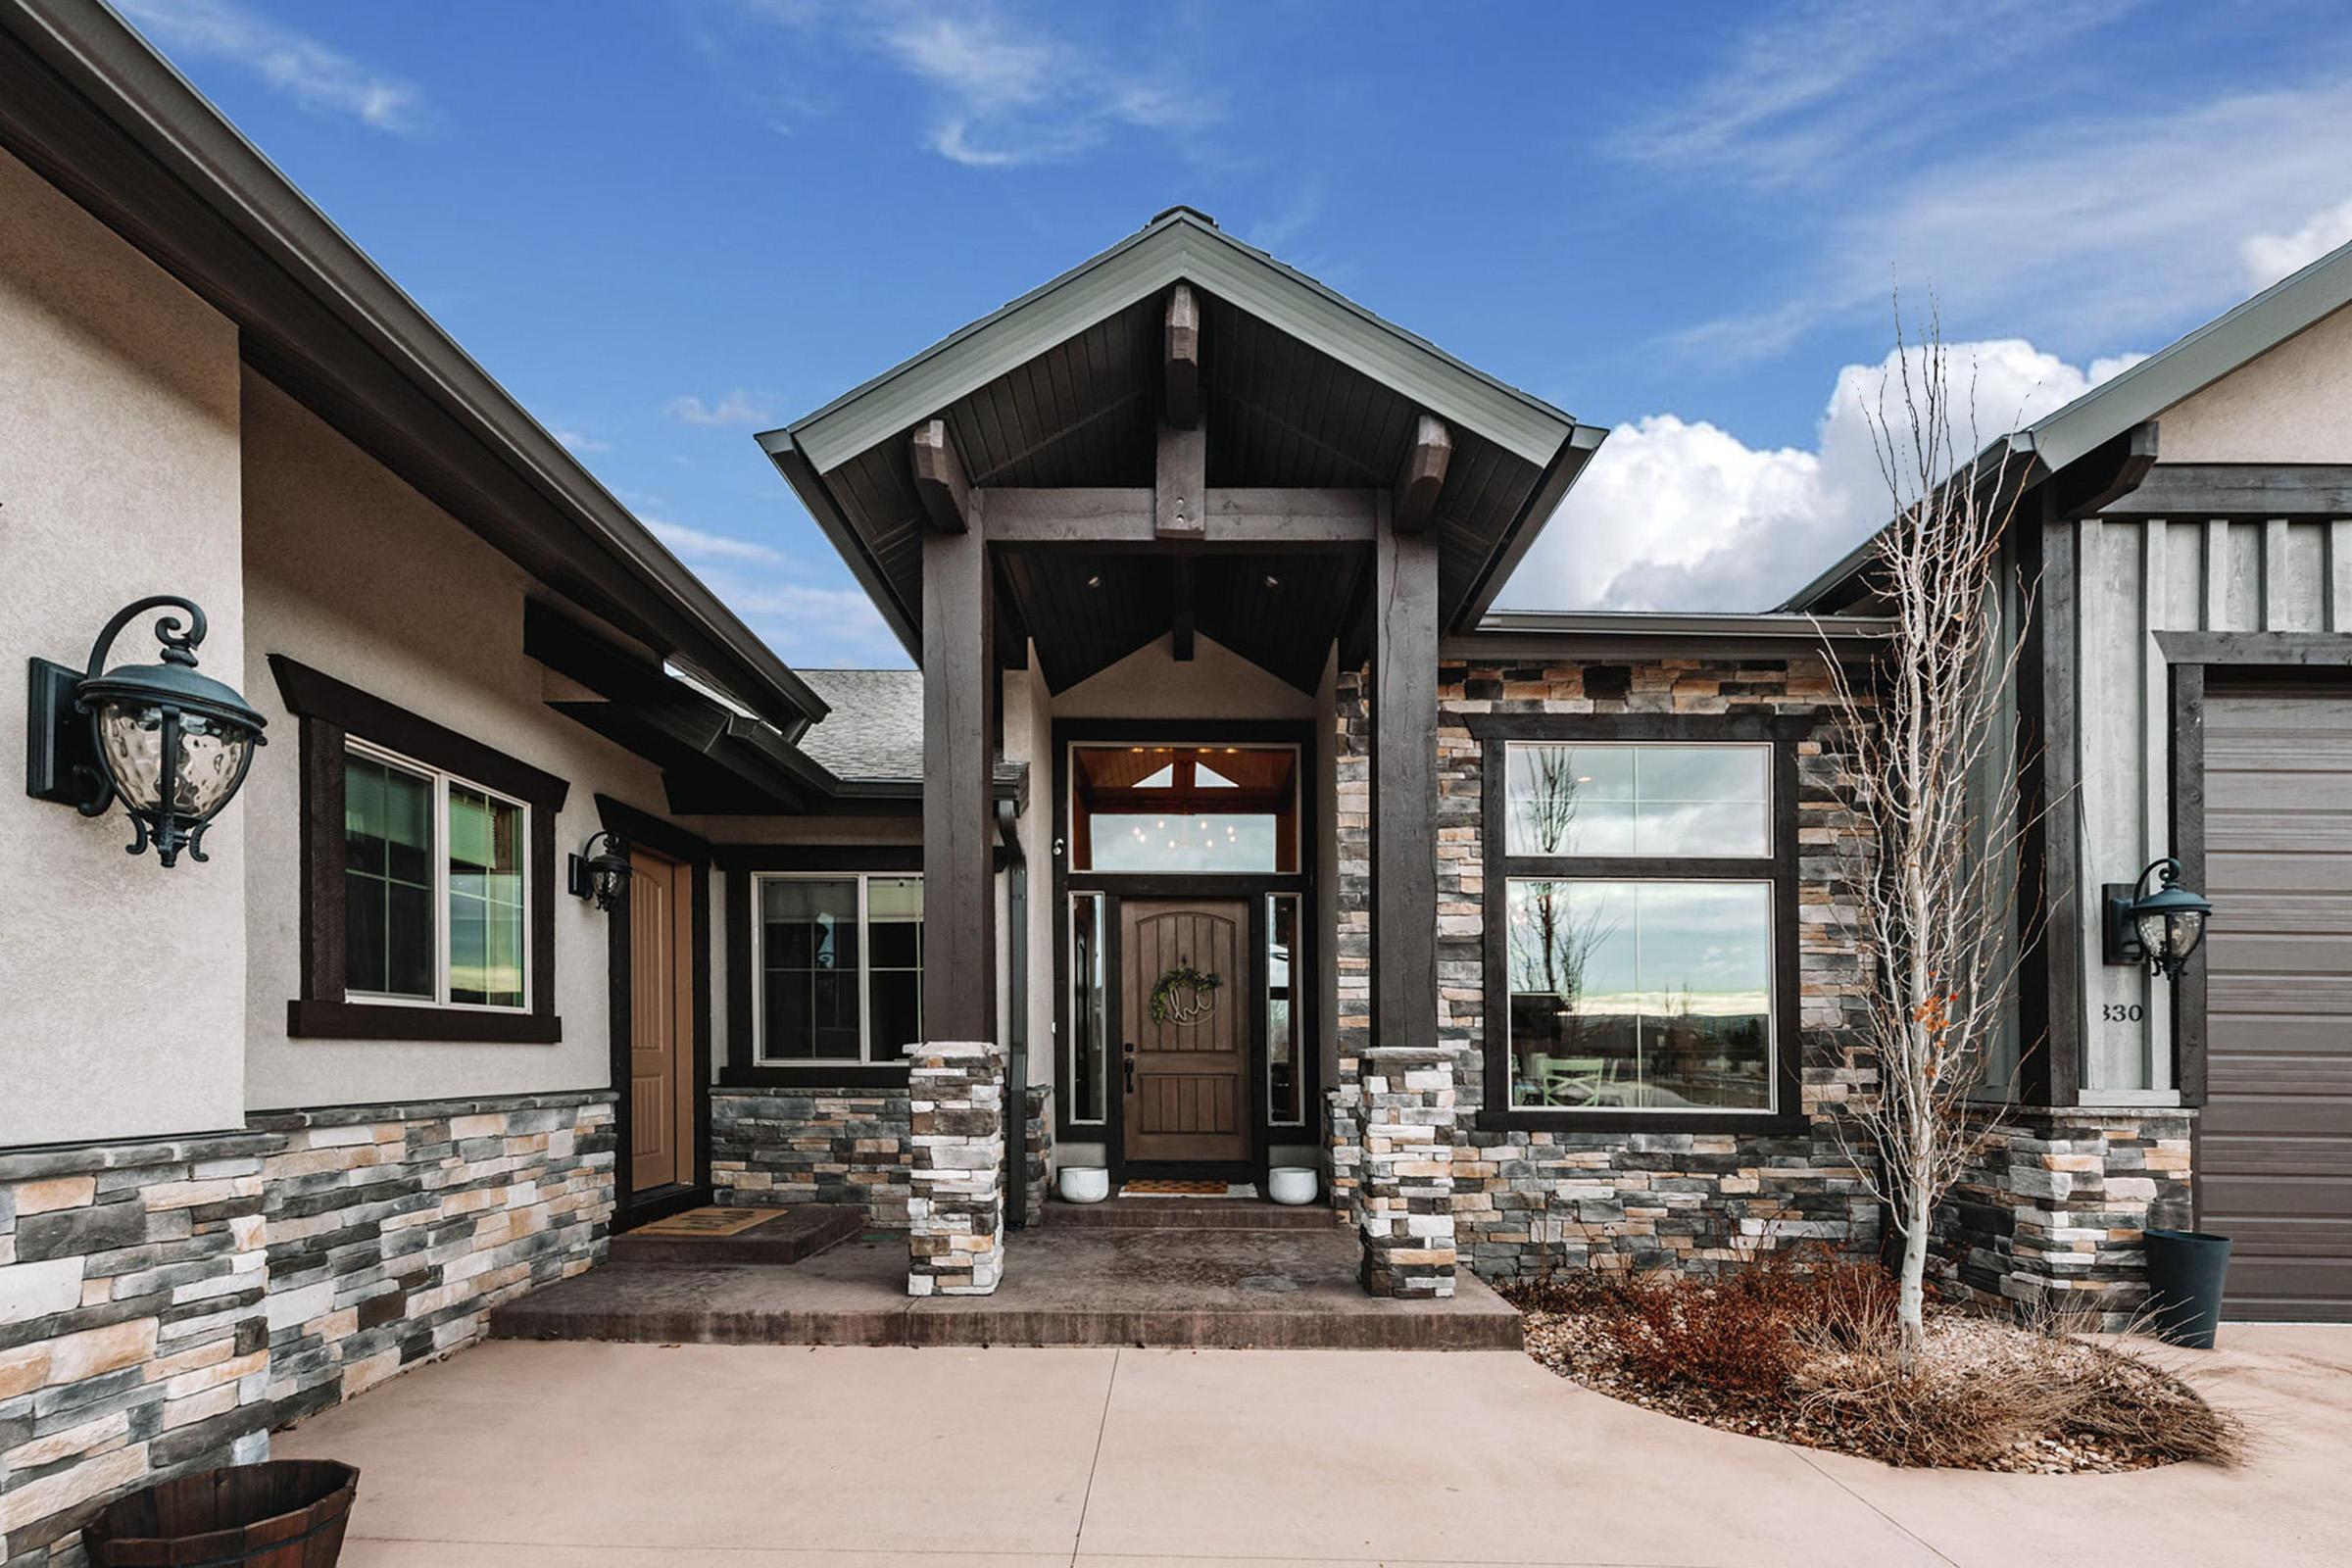 830 Summit Haven Circle, Francis, Utah 84036, 6 Bedrooms Bedrooms, ,4 BathroomsBathrooms,Single Family,For Sale,Summit Haven,12101436